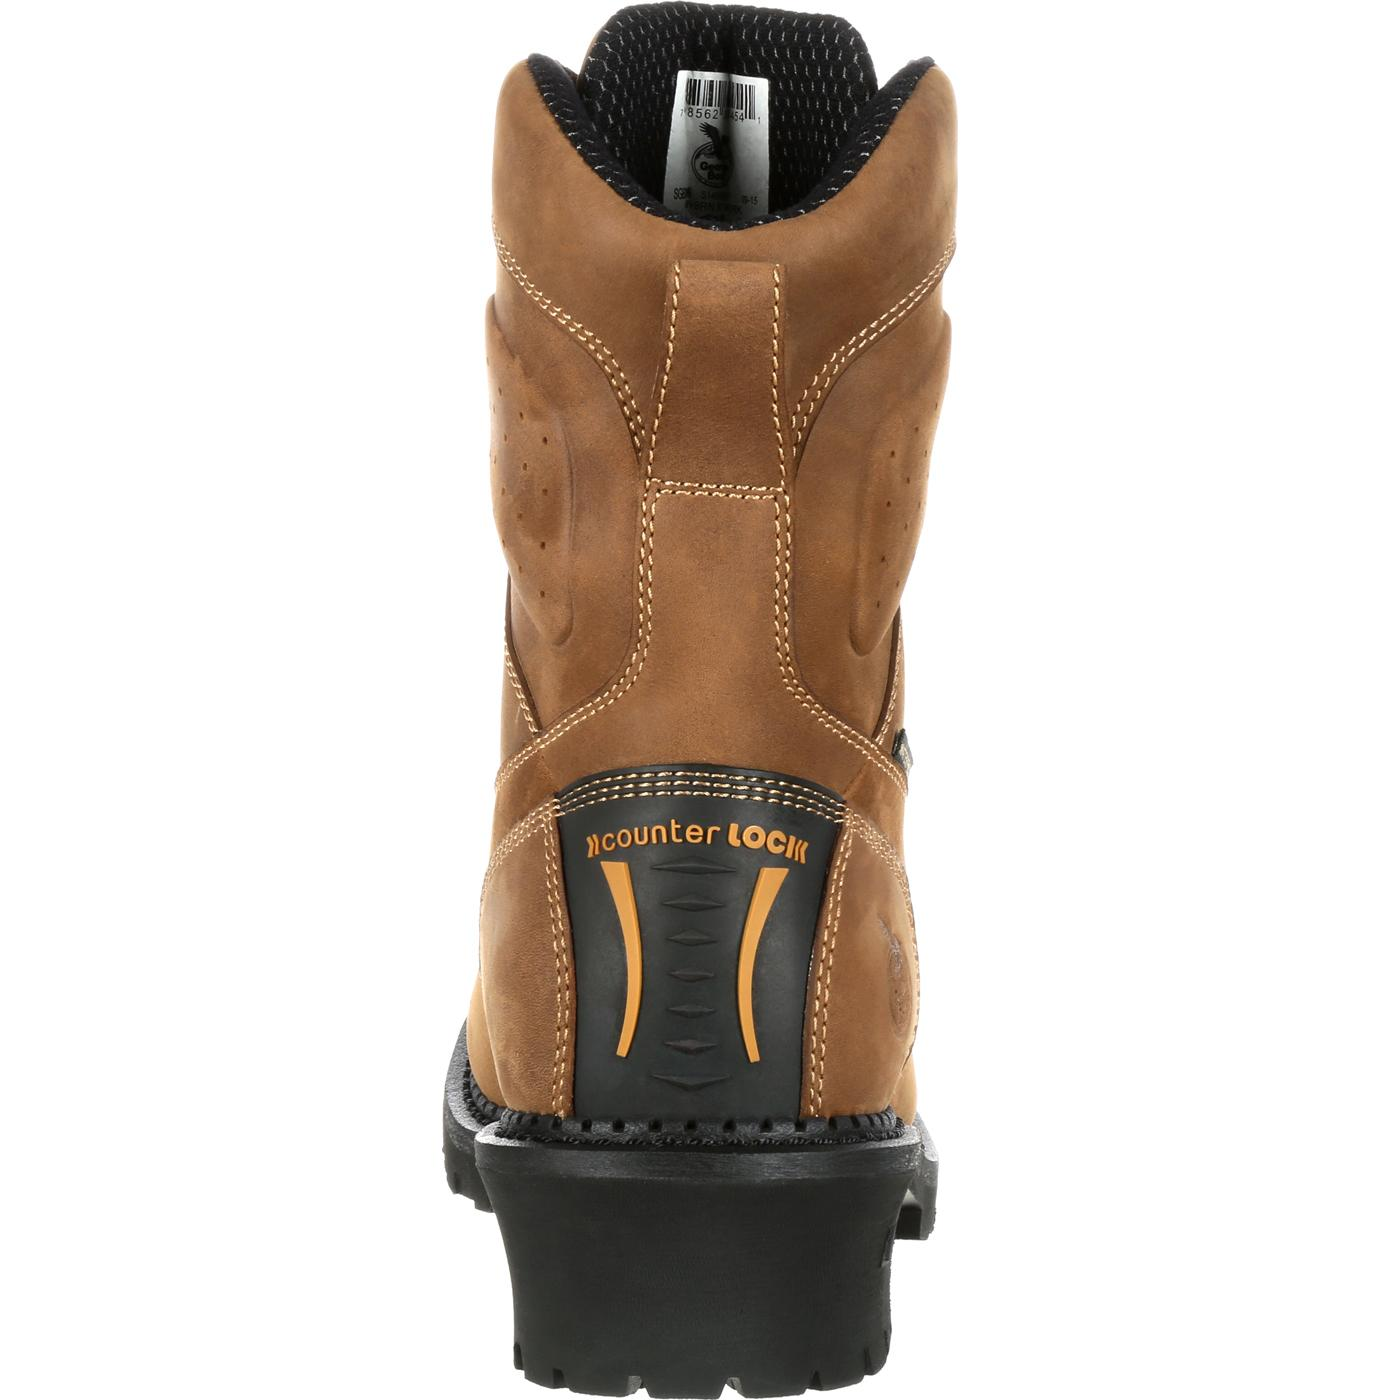 6b81e712a90 Georgia Boot Comfort Core Logger Waterproof Work Boot